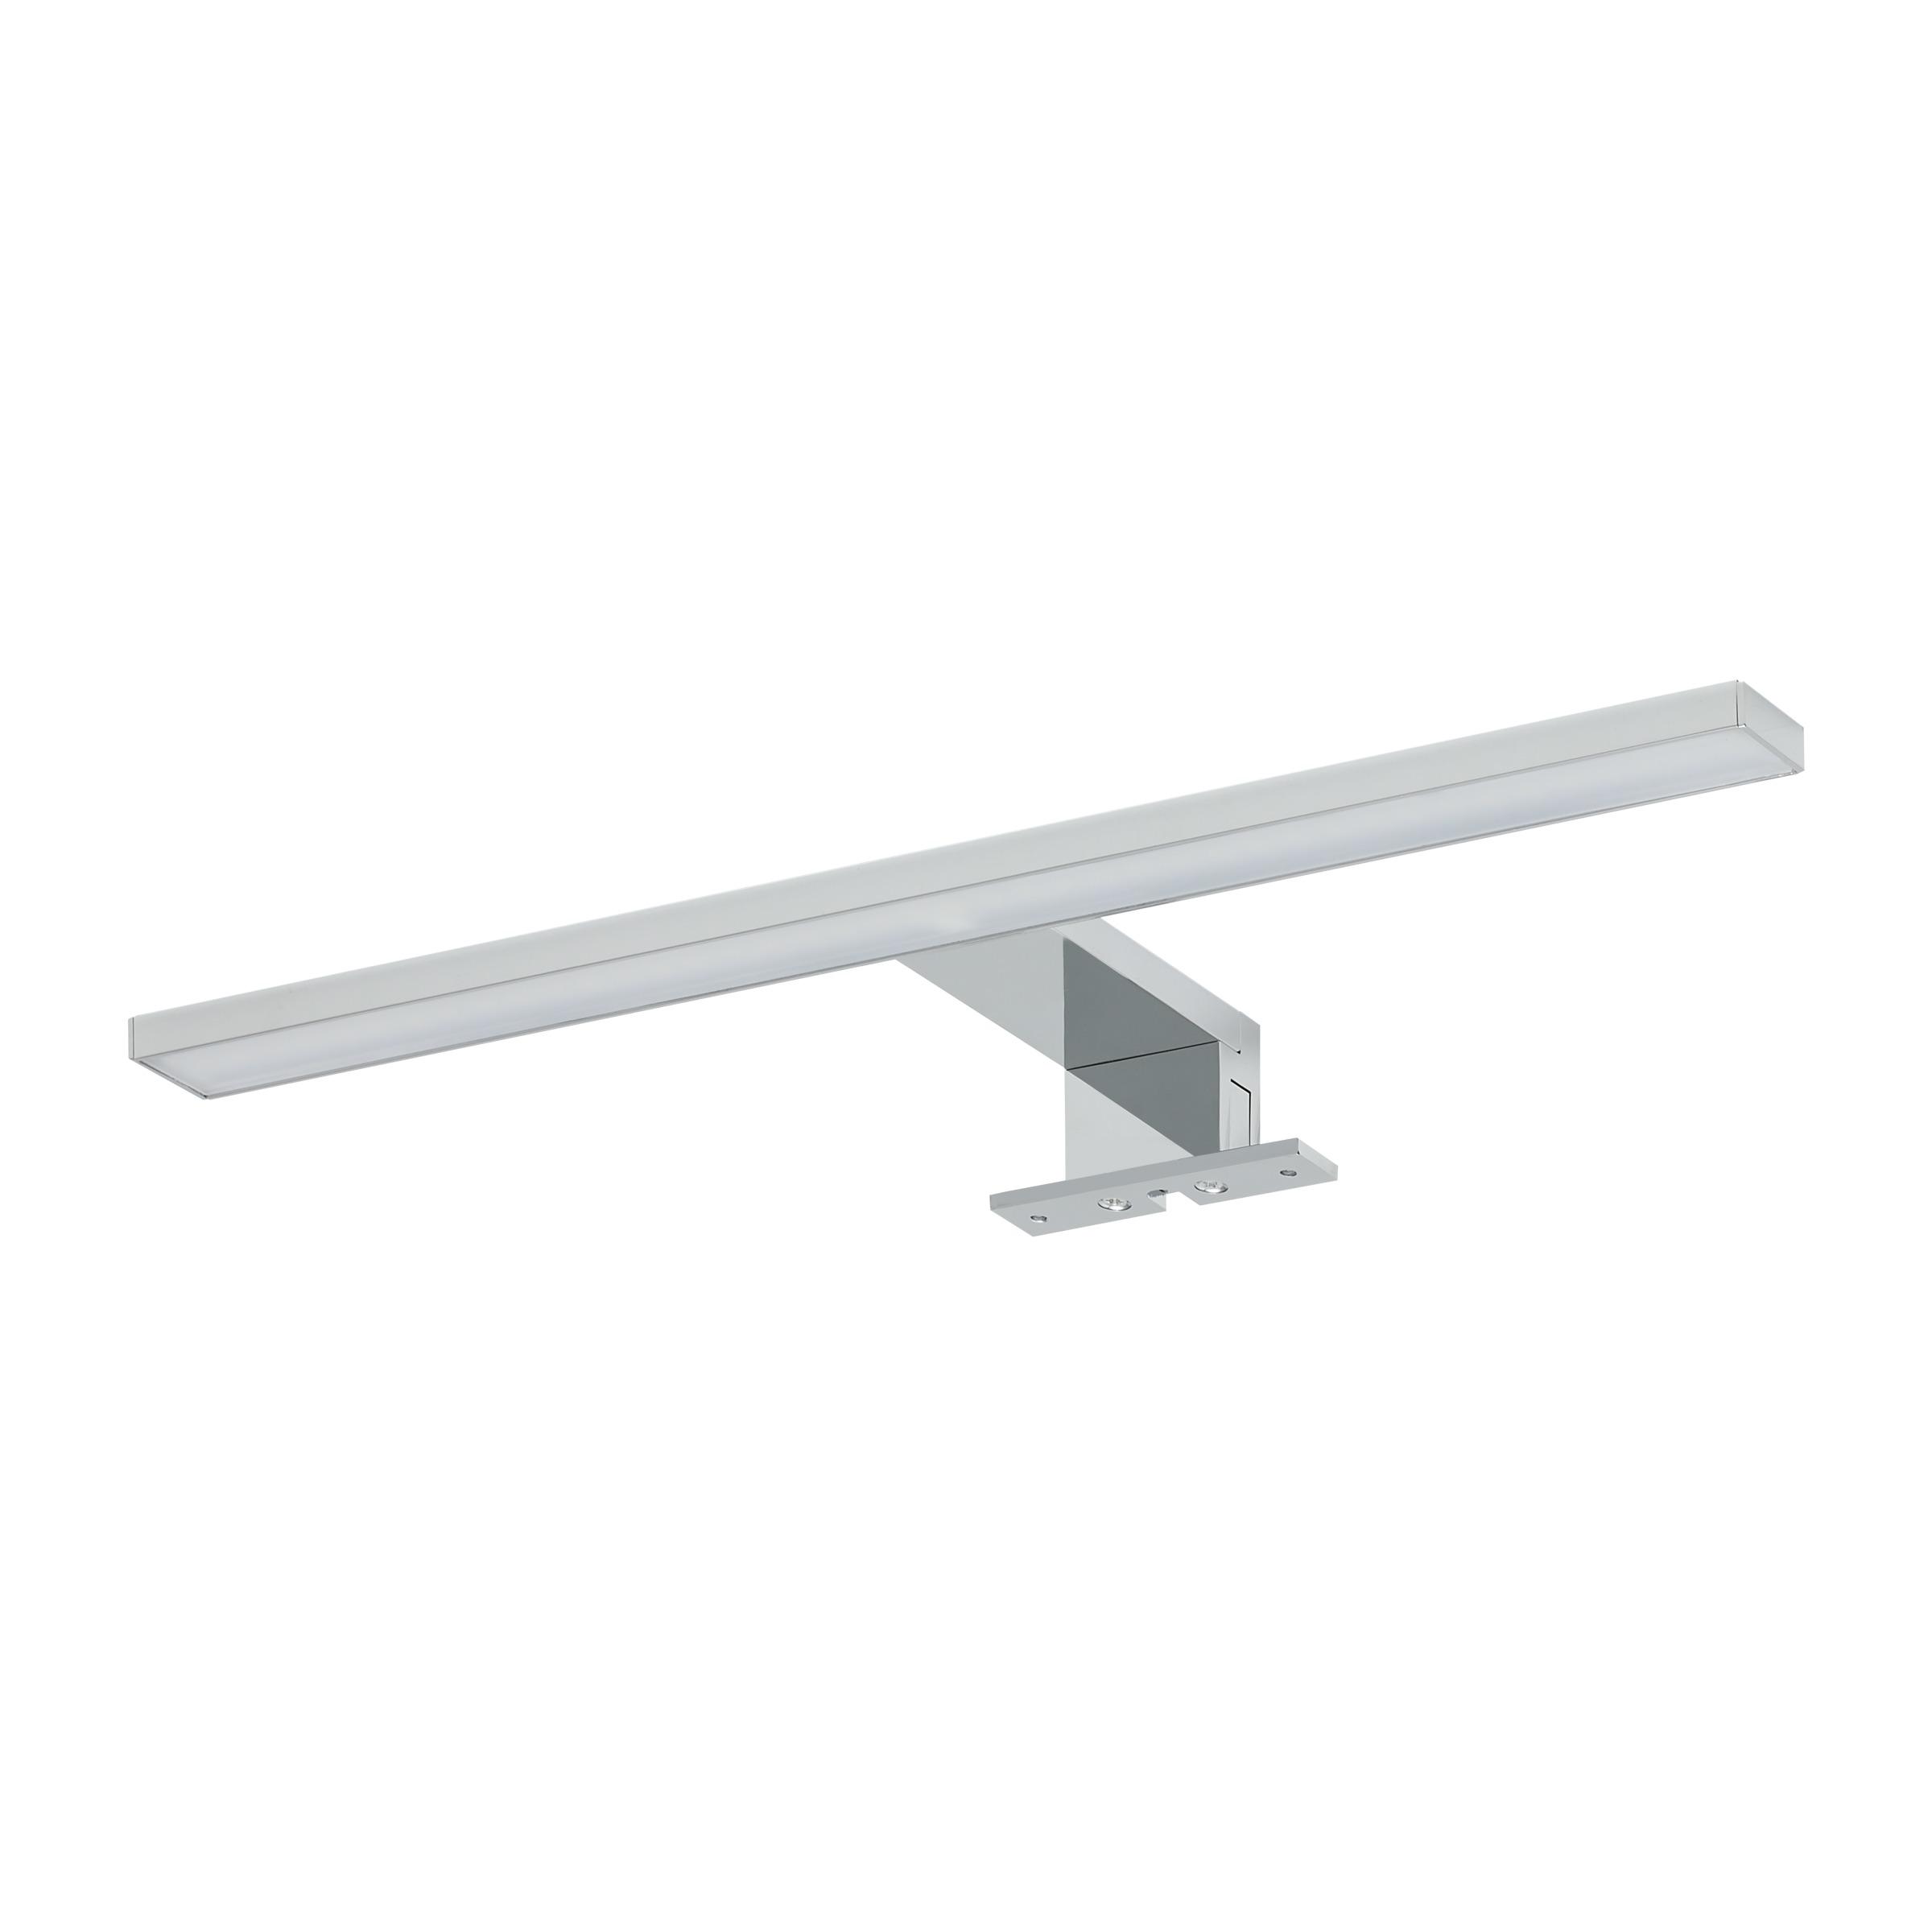 Aurel 40 cm LED-verlichting